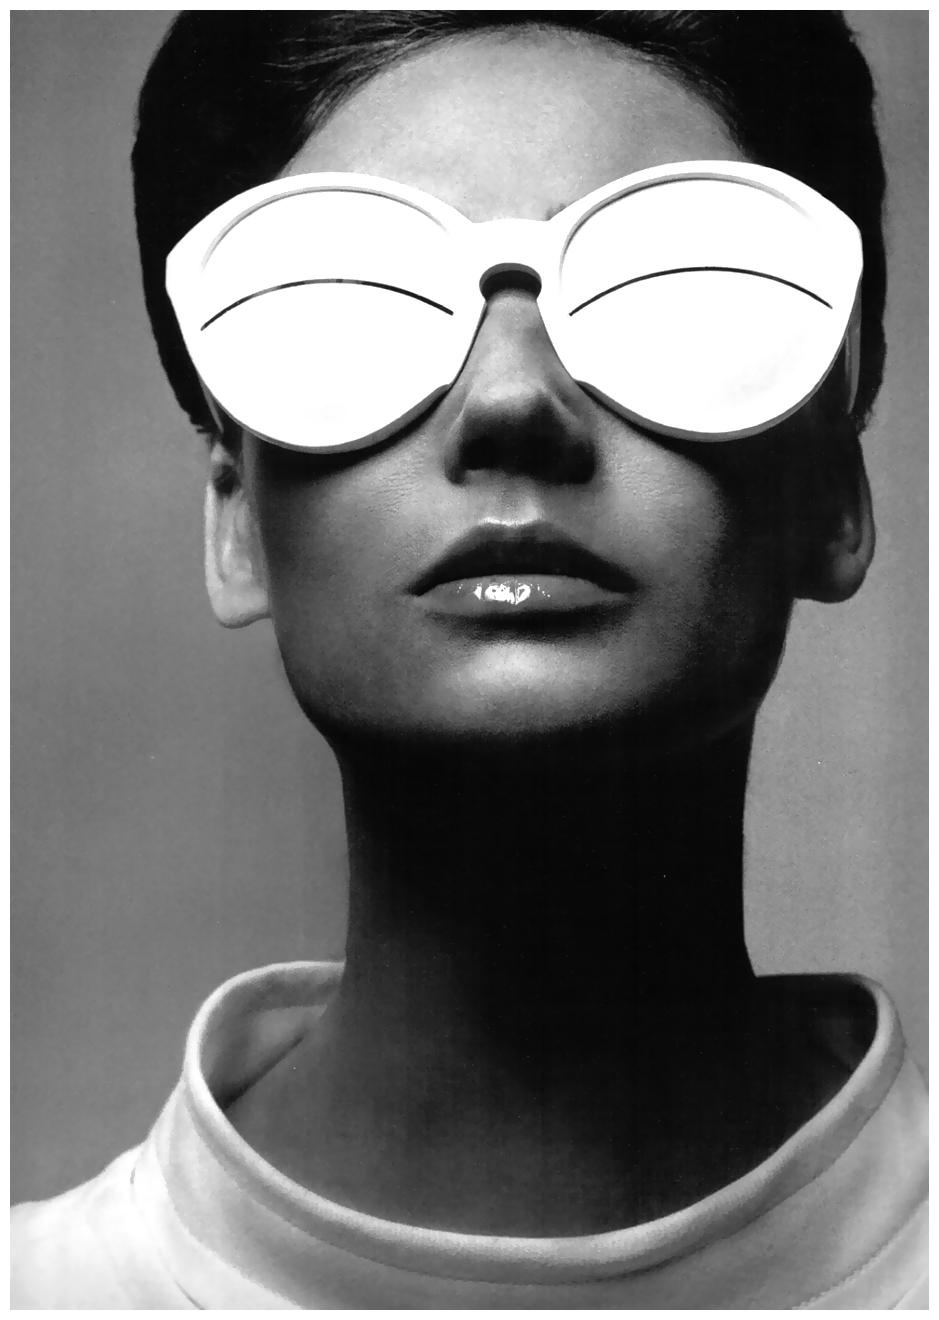 simone-paris-in-coureges-1965-photo-richard-avedon.jpeg